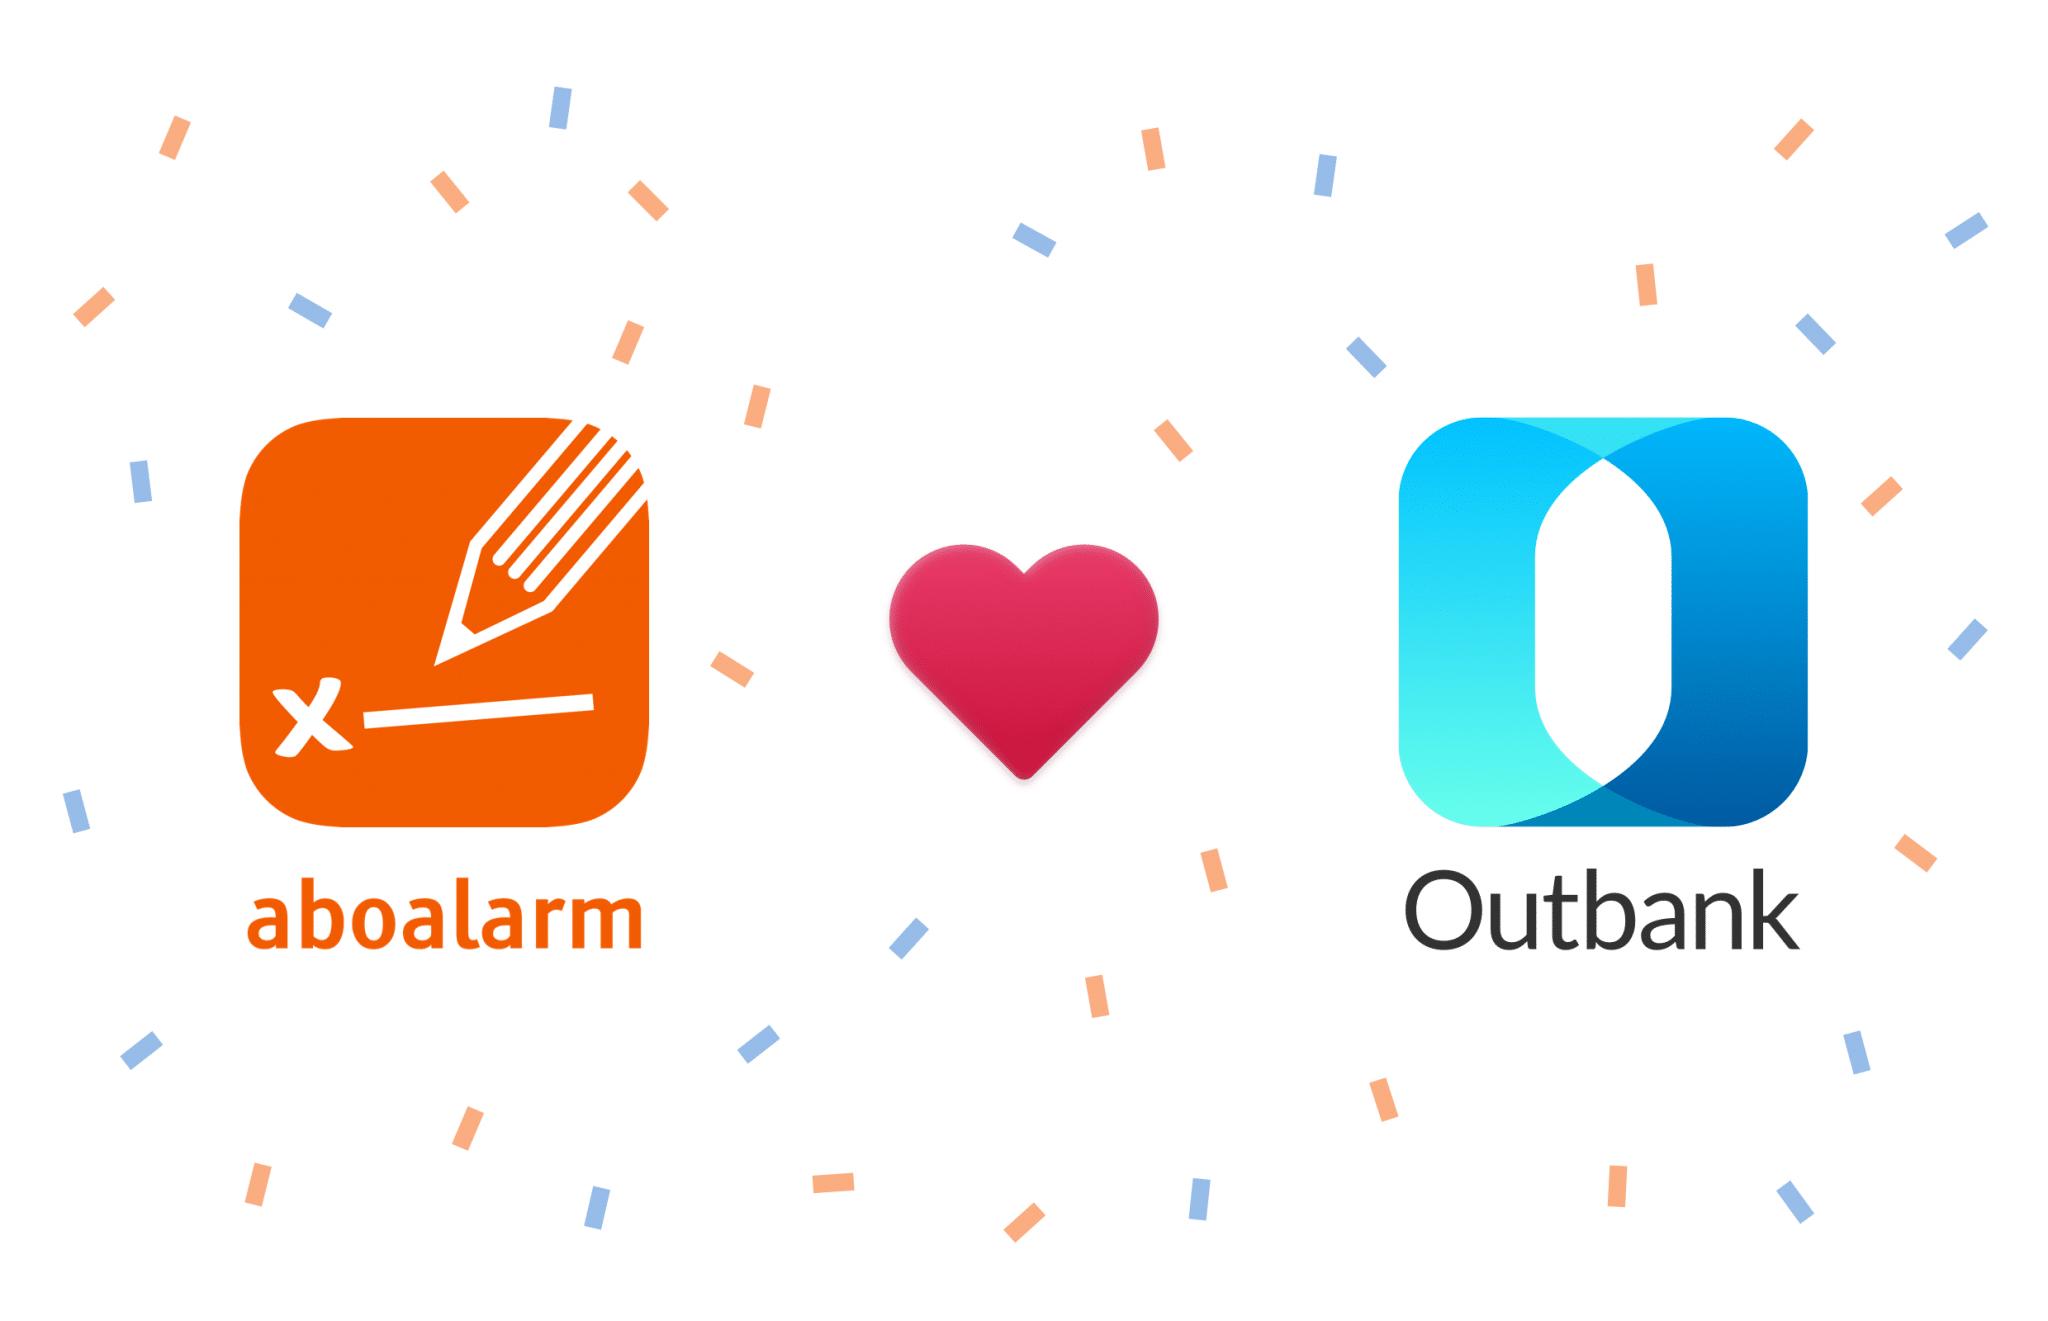 Outbank ist Teil der Aboalarm GmbH